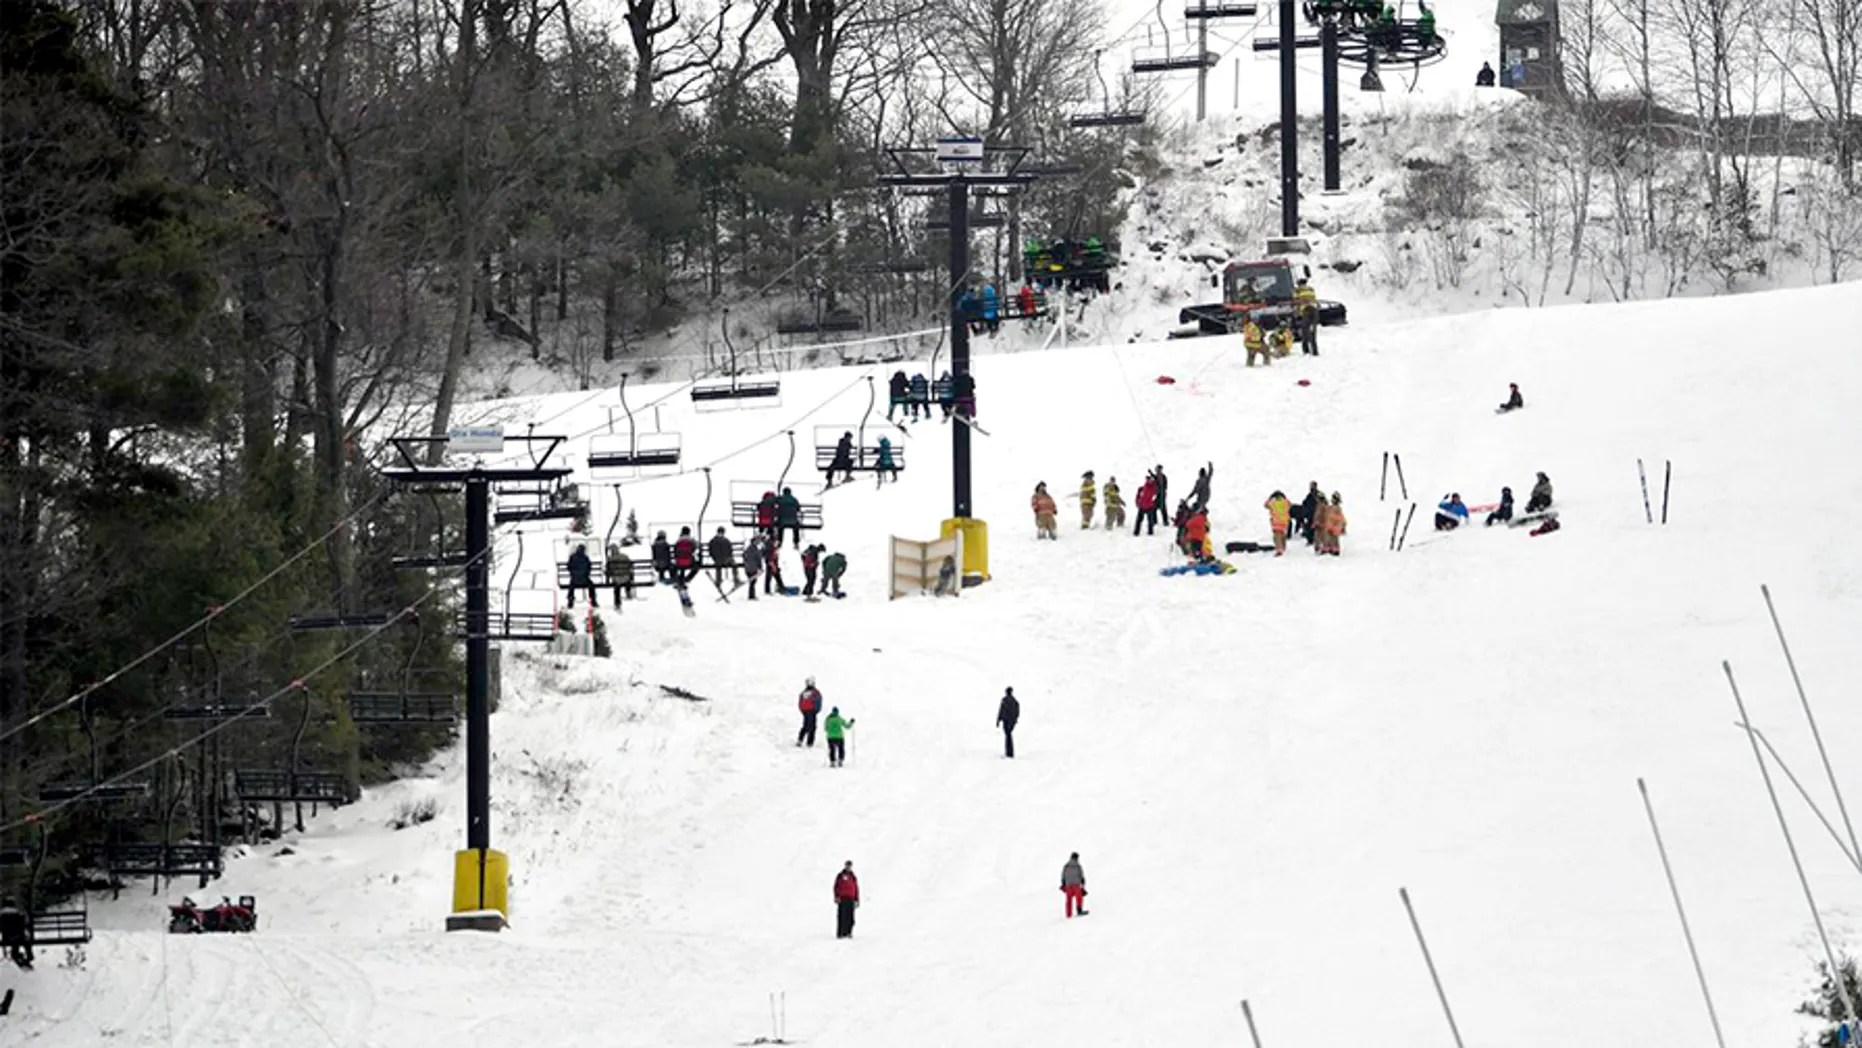 ski chair lift malfunction cheap papasan chairs for sale 5 injured after malfunctions at pennsylvania resort fox news